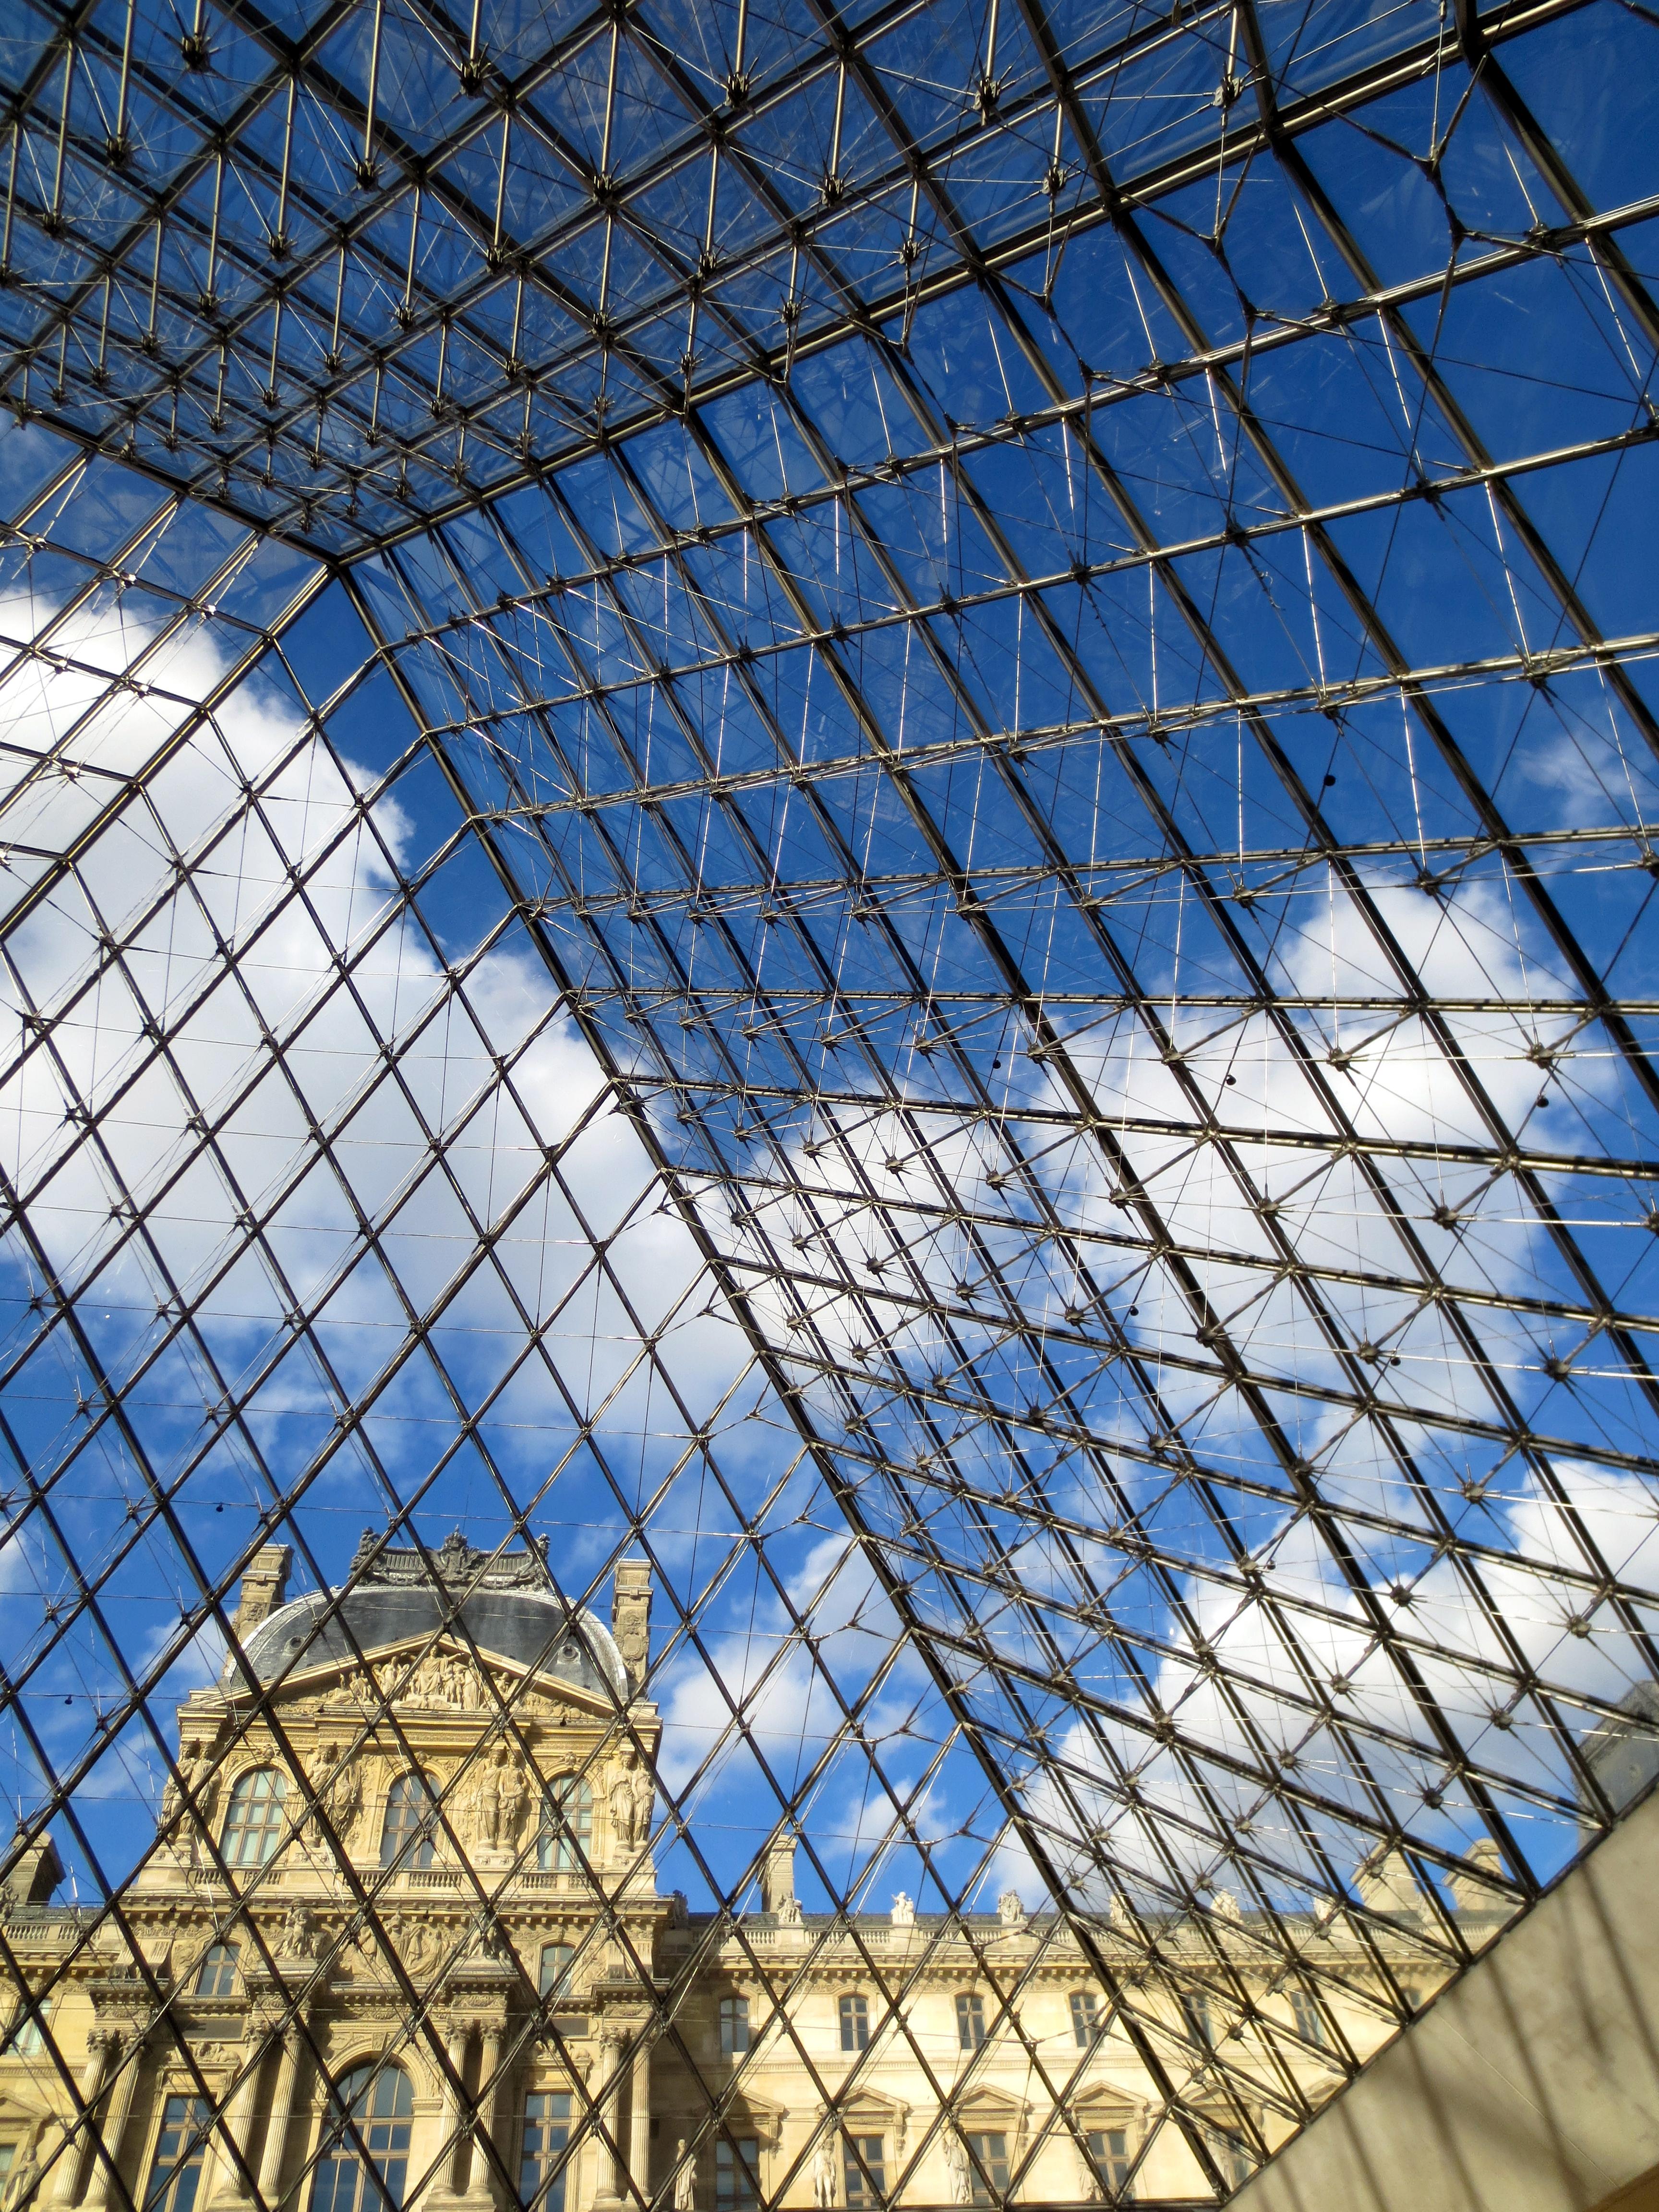 Below the Louvre